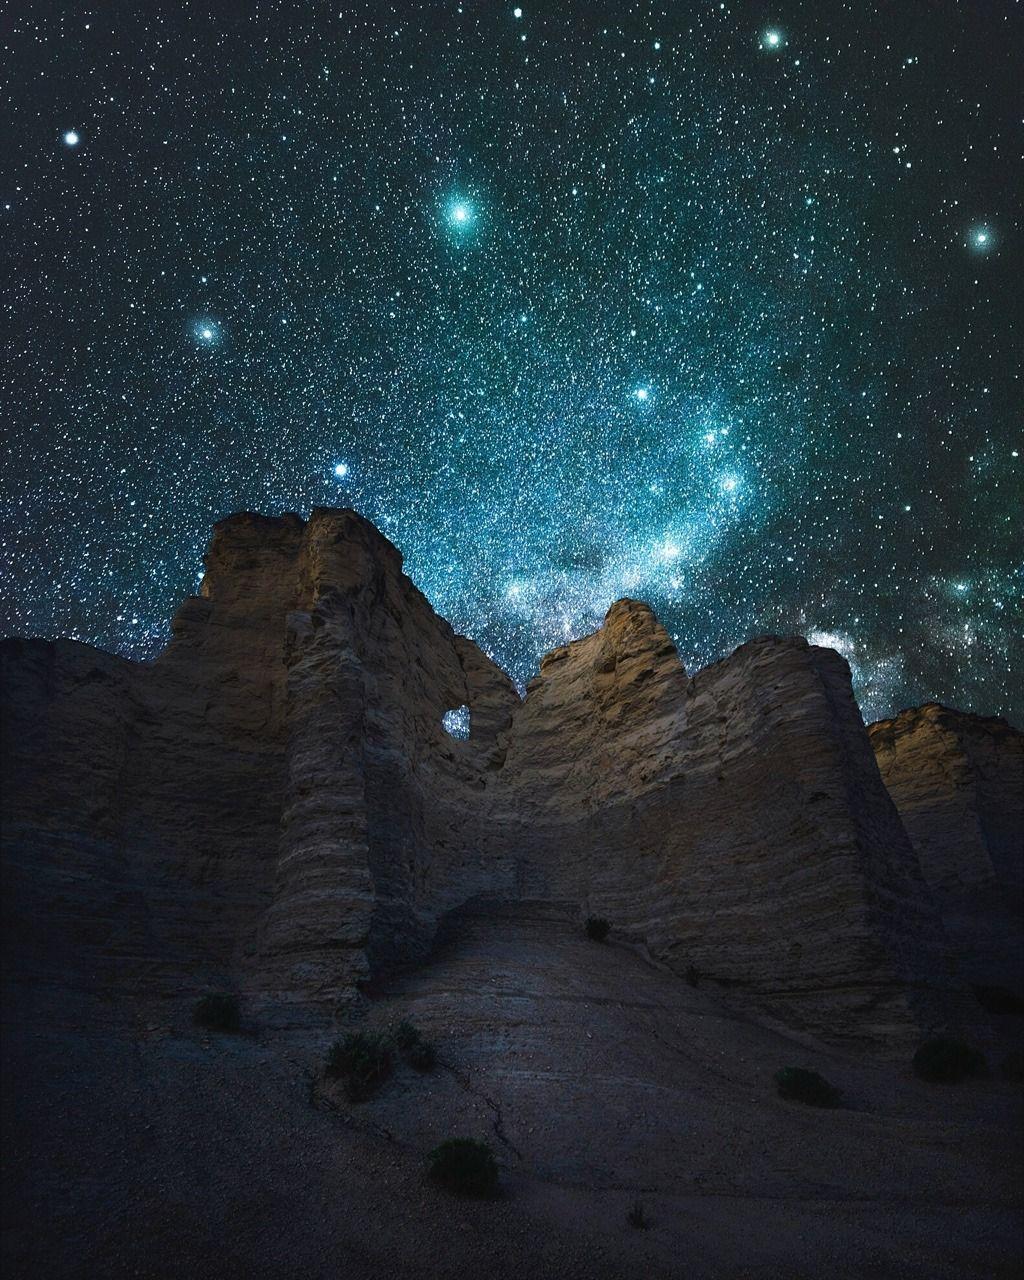 Jaxson Pohlman Monument Rocks Kansas Night Skies Images In